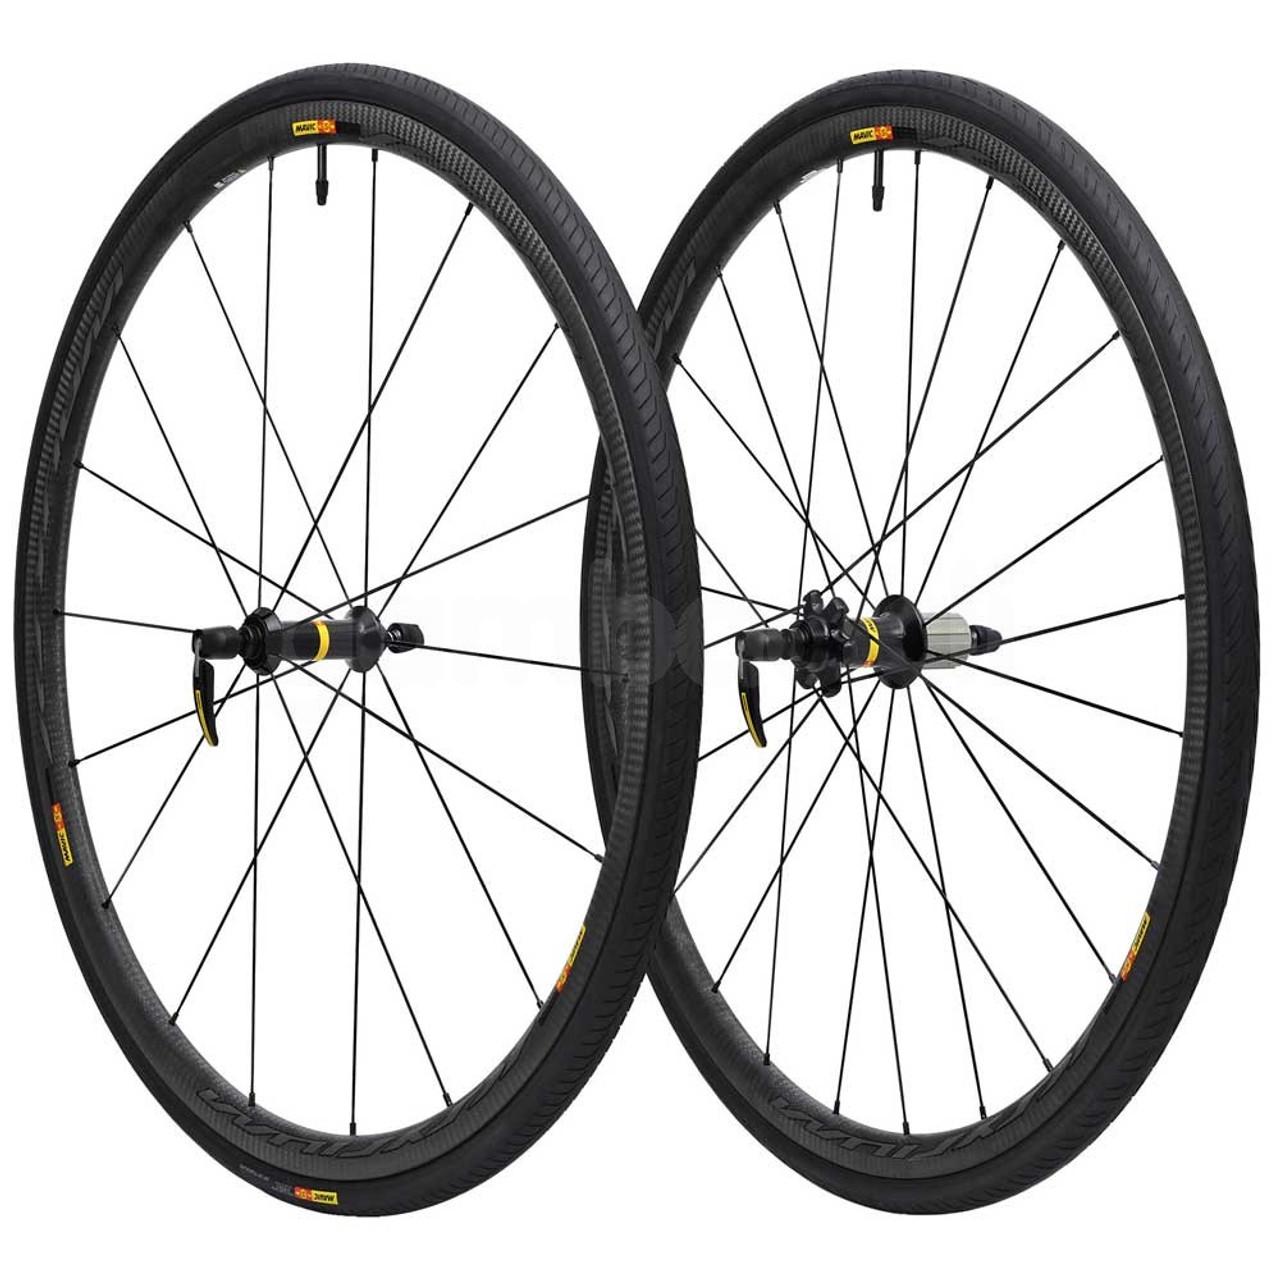 0dbaa2e4a42 Texas Cyclesport Mavic Ksyrium Pro Carbon SL C Wheelset MV-KSY-PRO-CB-SLC  2199.99 New